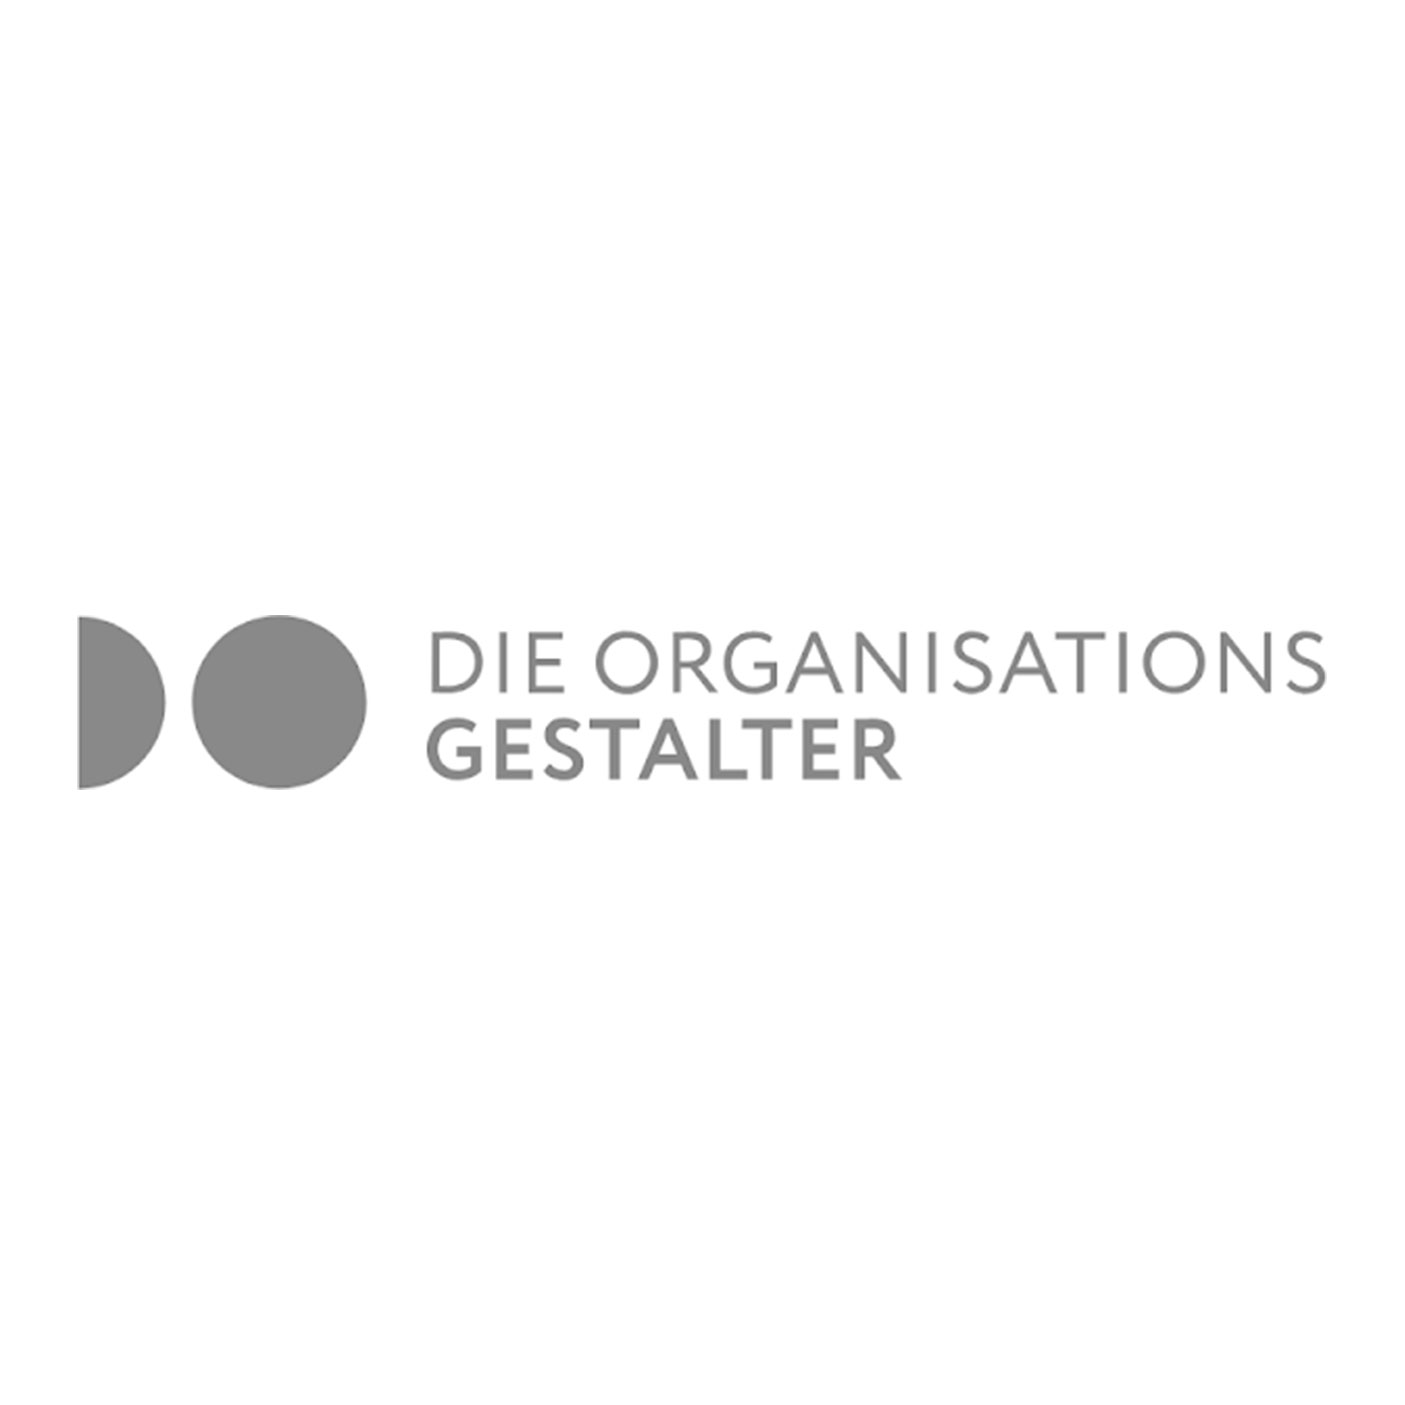 Die Organisationsgestalter